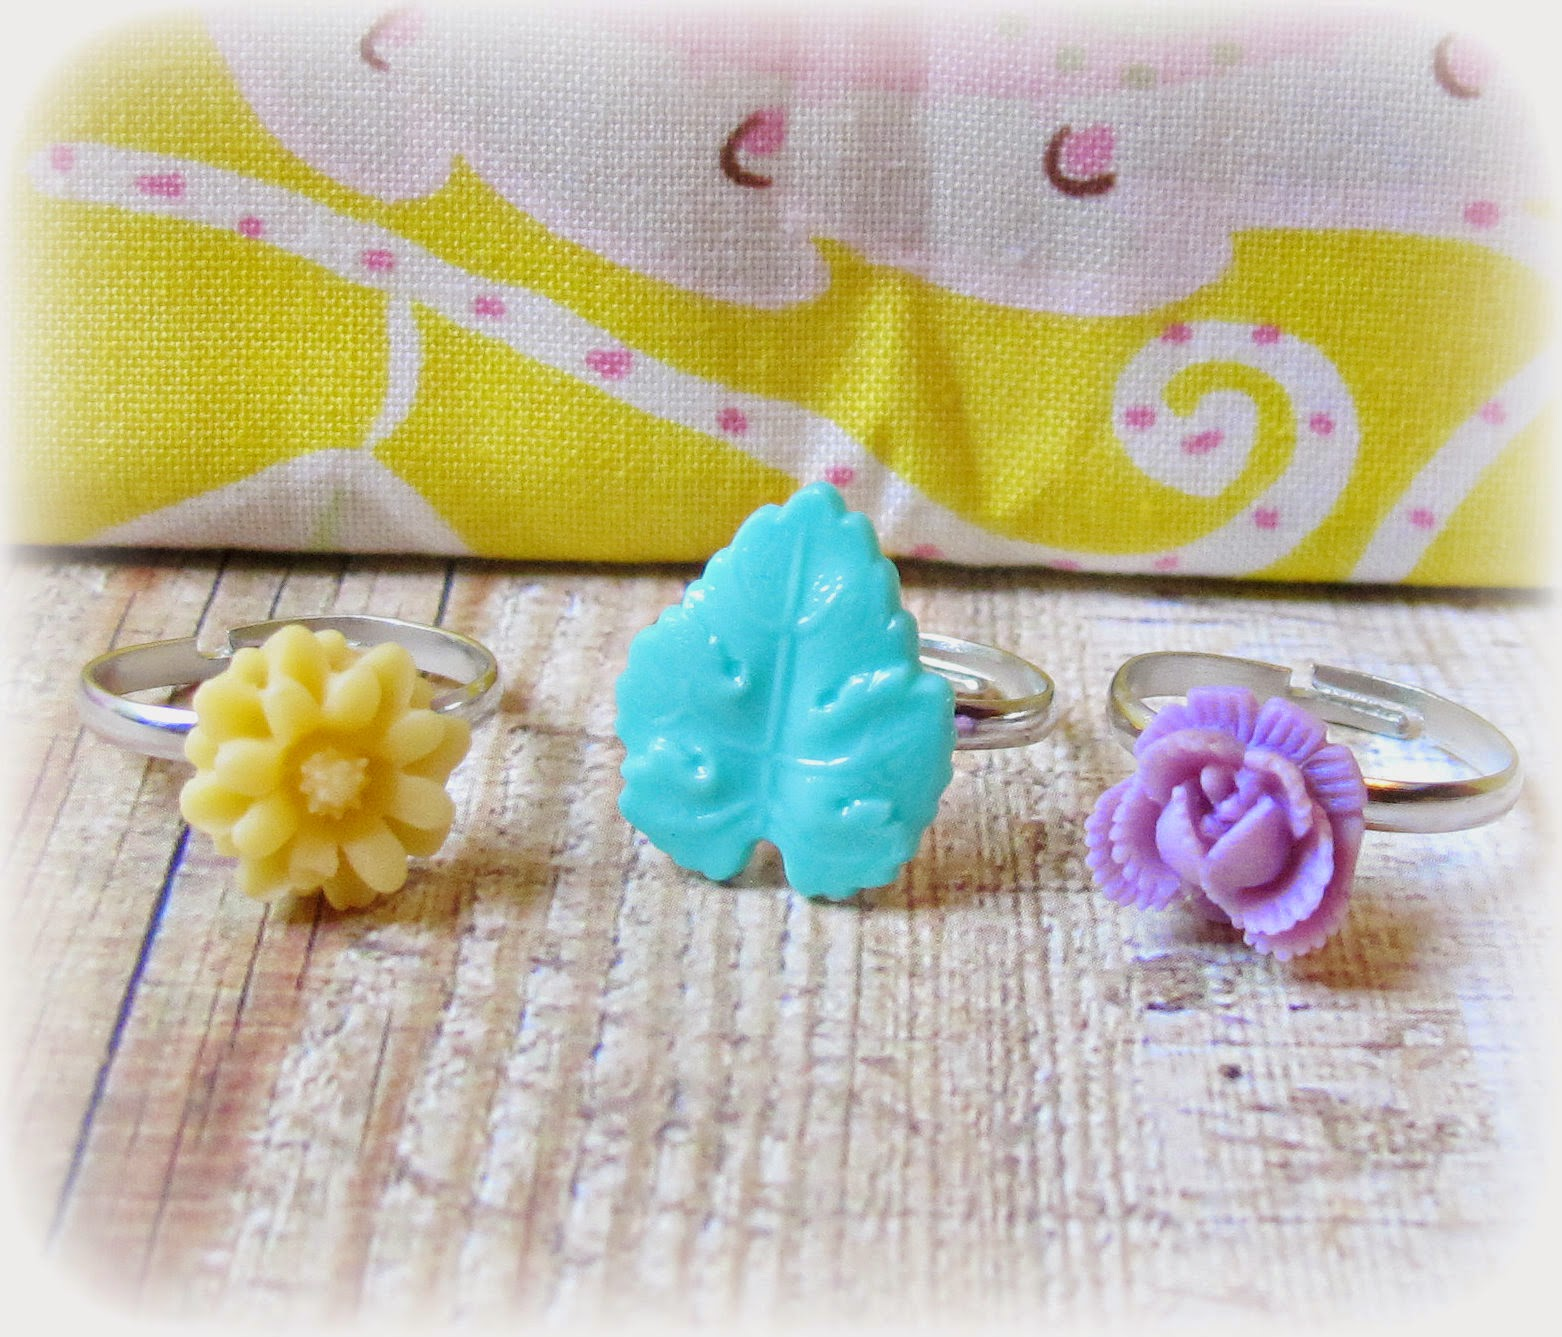 image agnieszka ring set children's jewellery jewelry two cheeky monkeys cream yellow green mint lilac purple rose flowers leaf